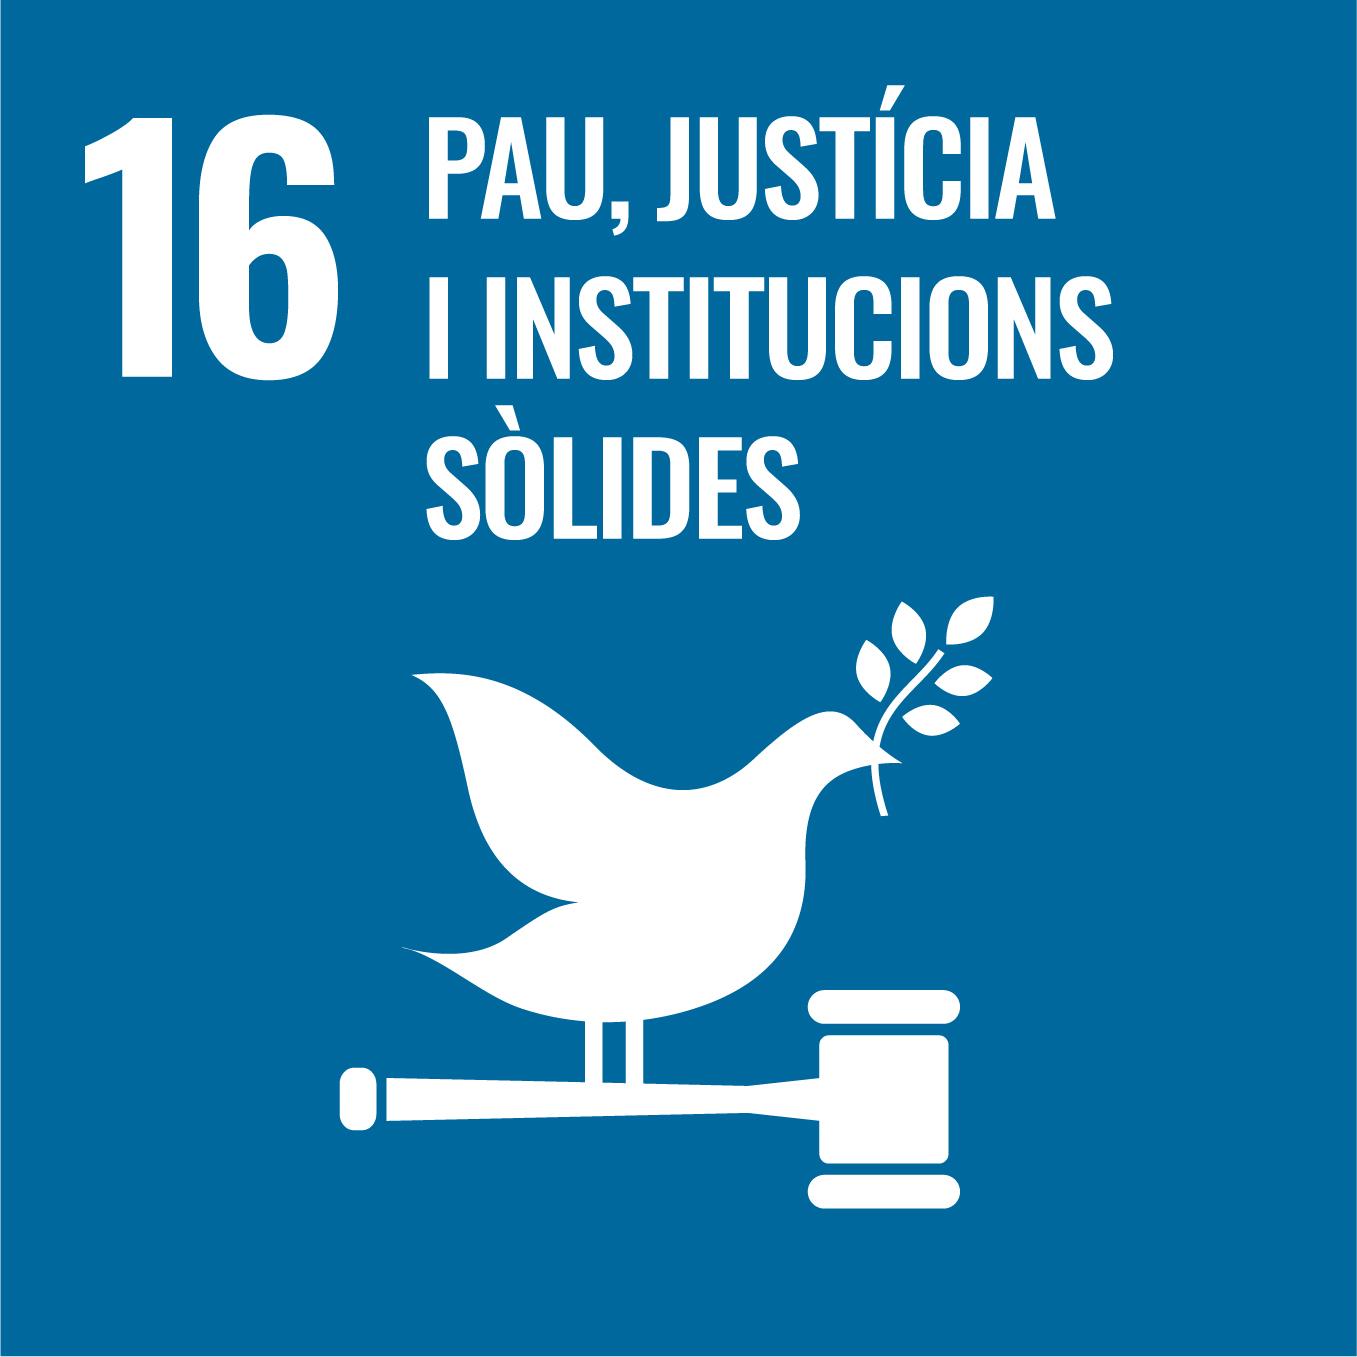 Pau, Justícia i Institucions sòlides - Objectiu 16